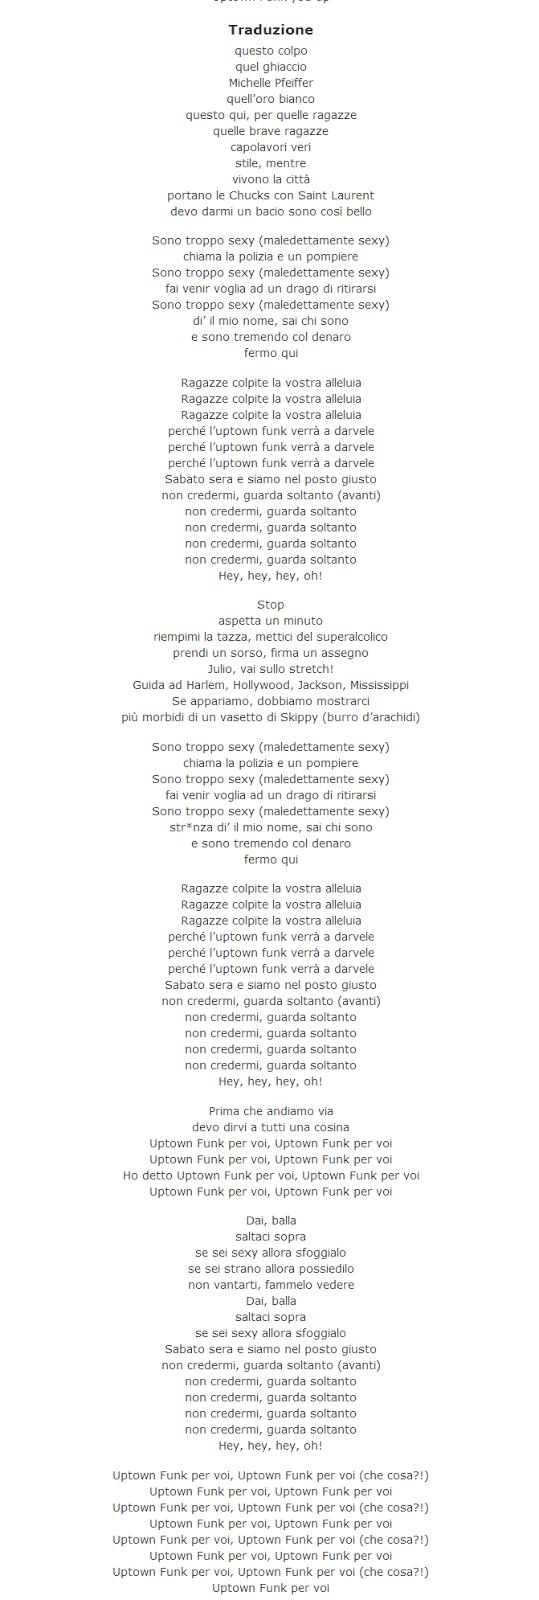 traduzione testo Uptown Funk Mark Ronson ft. Bruno Mars lyrics